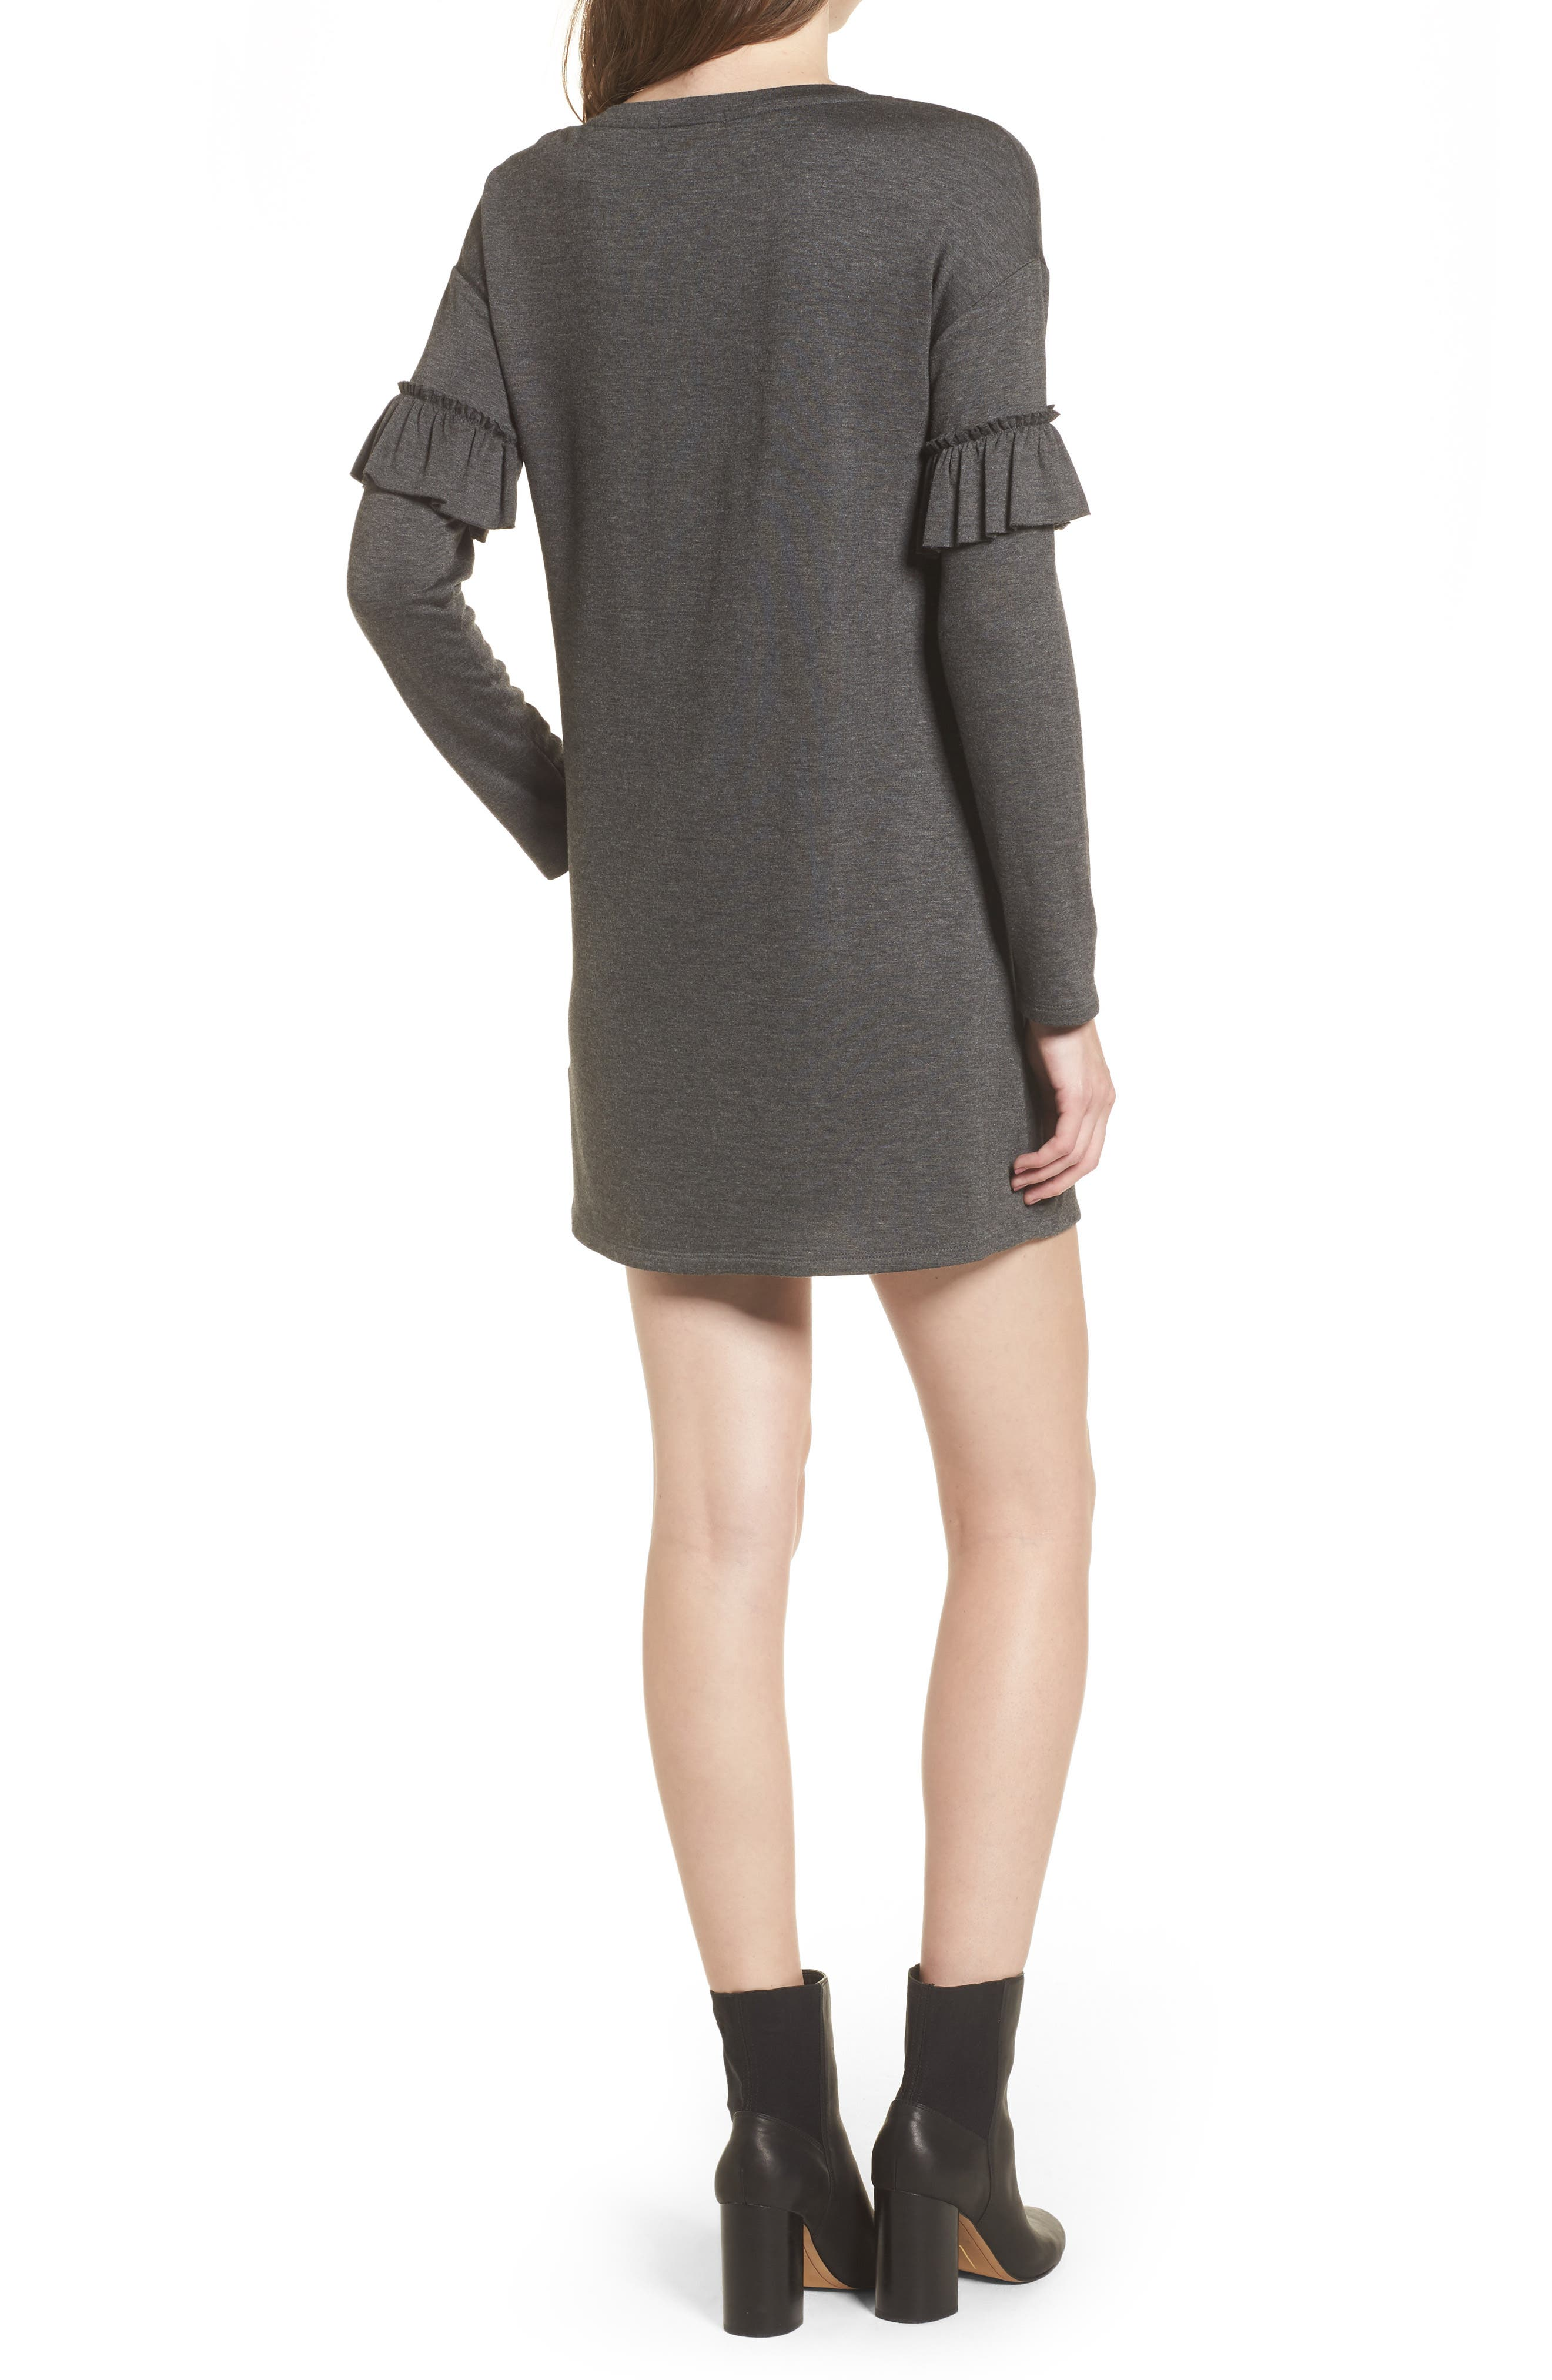 Ruffle Sleeve Sweater Dress,                             Alternate thumbnail 2, color,                             Charcoal